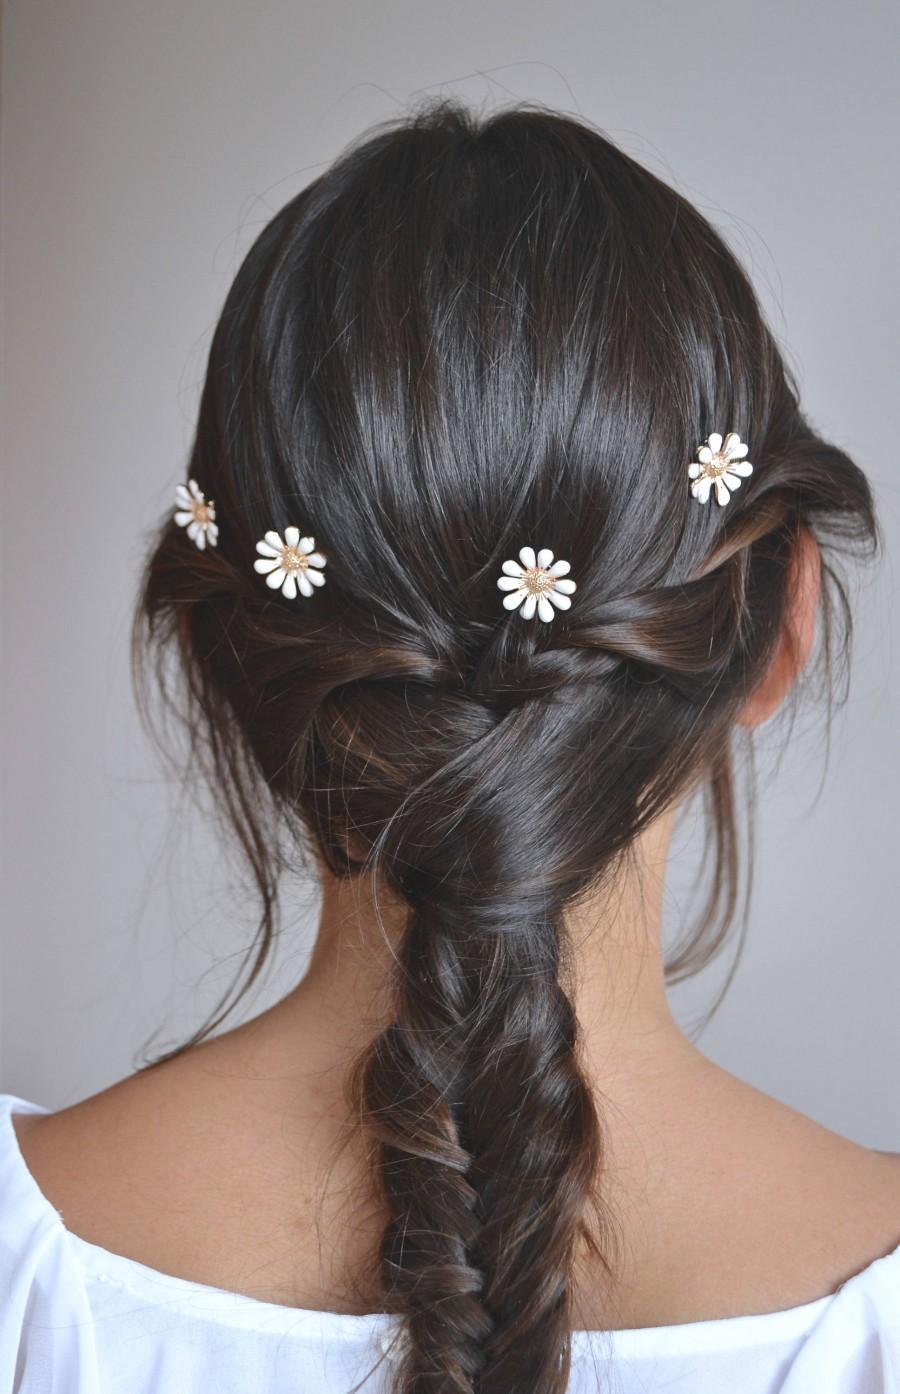 Свадьба - Lot of 3 hair spades head jewel wedding, wedding bun pic. Flower, white daisy. Romantic Boheme